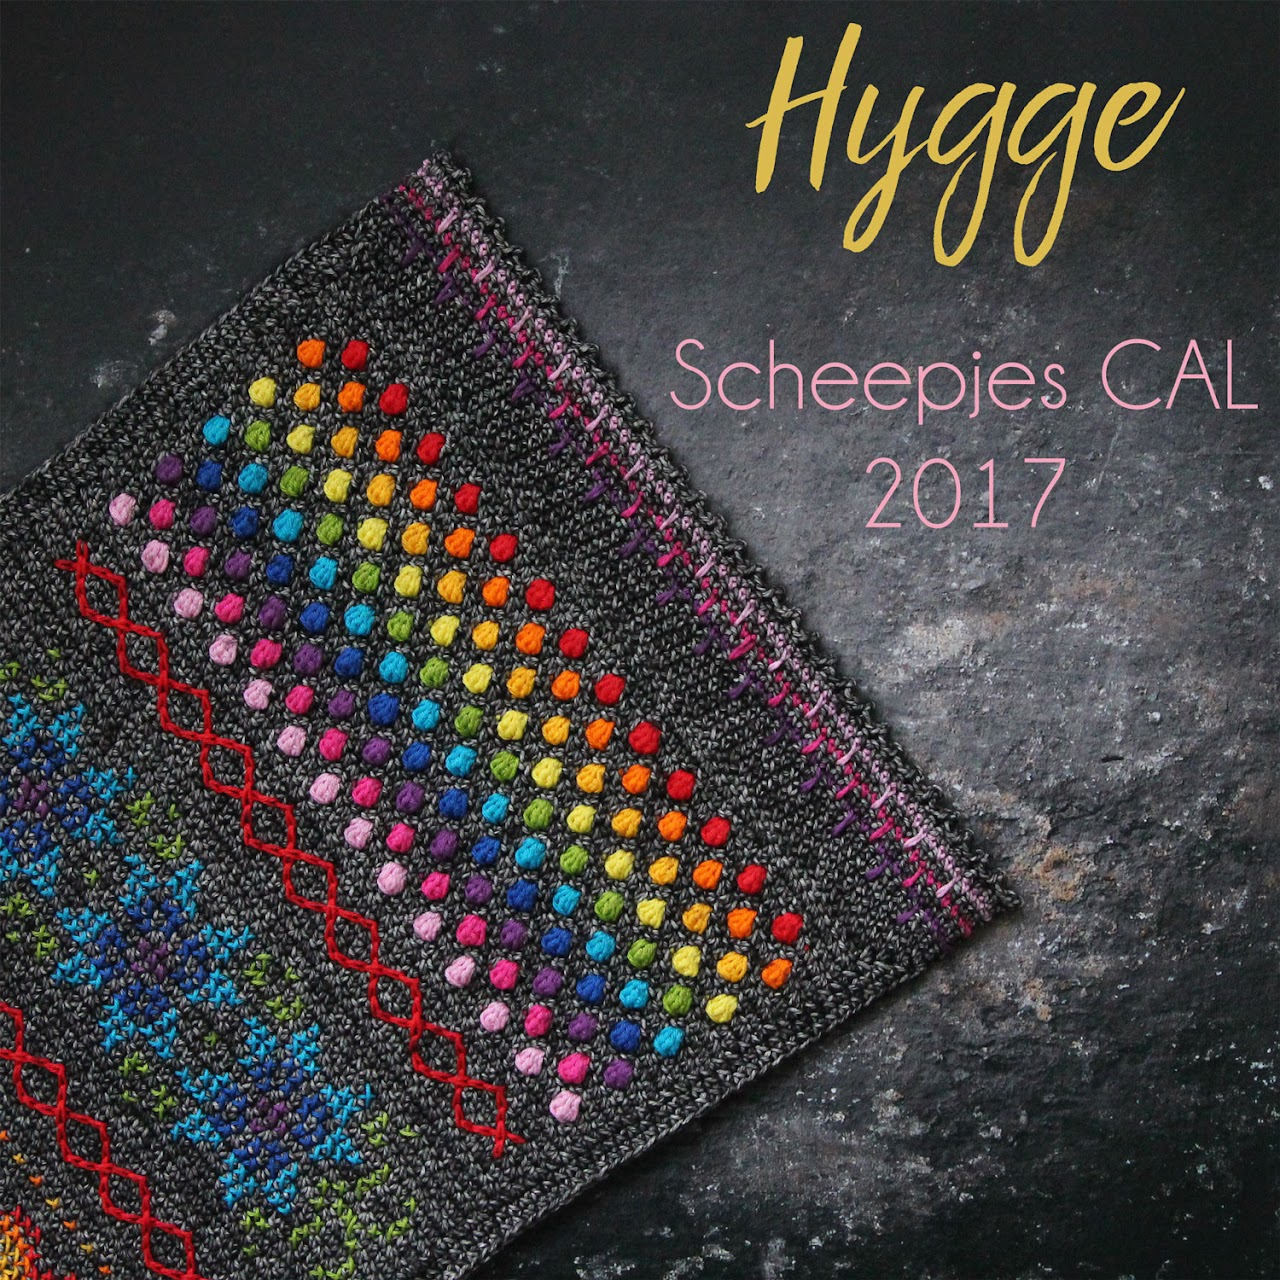 Hygge Scheepjes CAL 2017